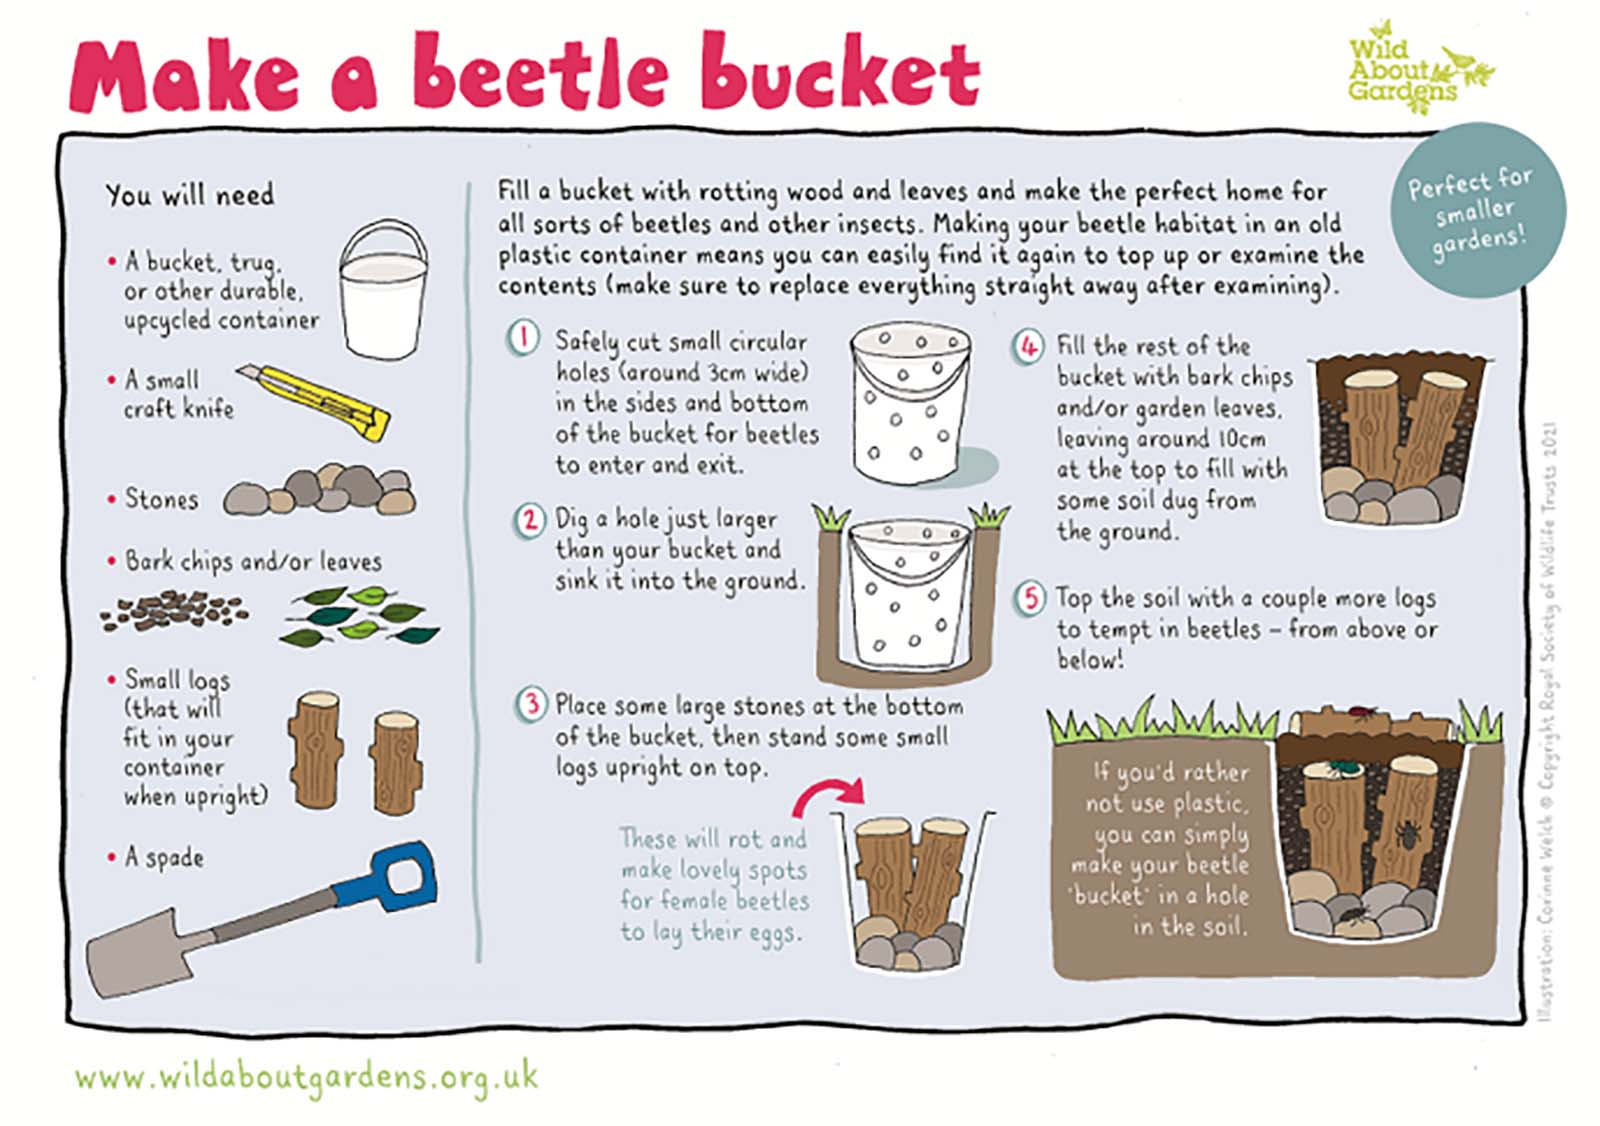 Make a beetle bucket